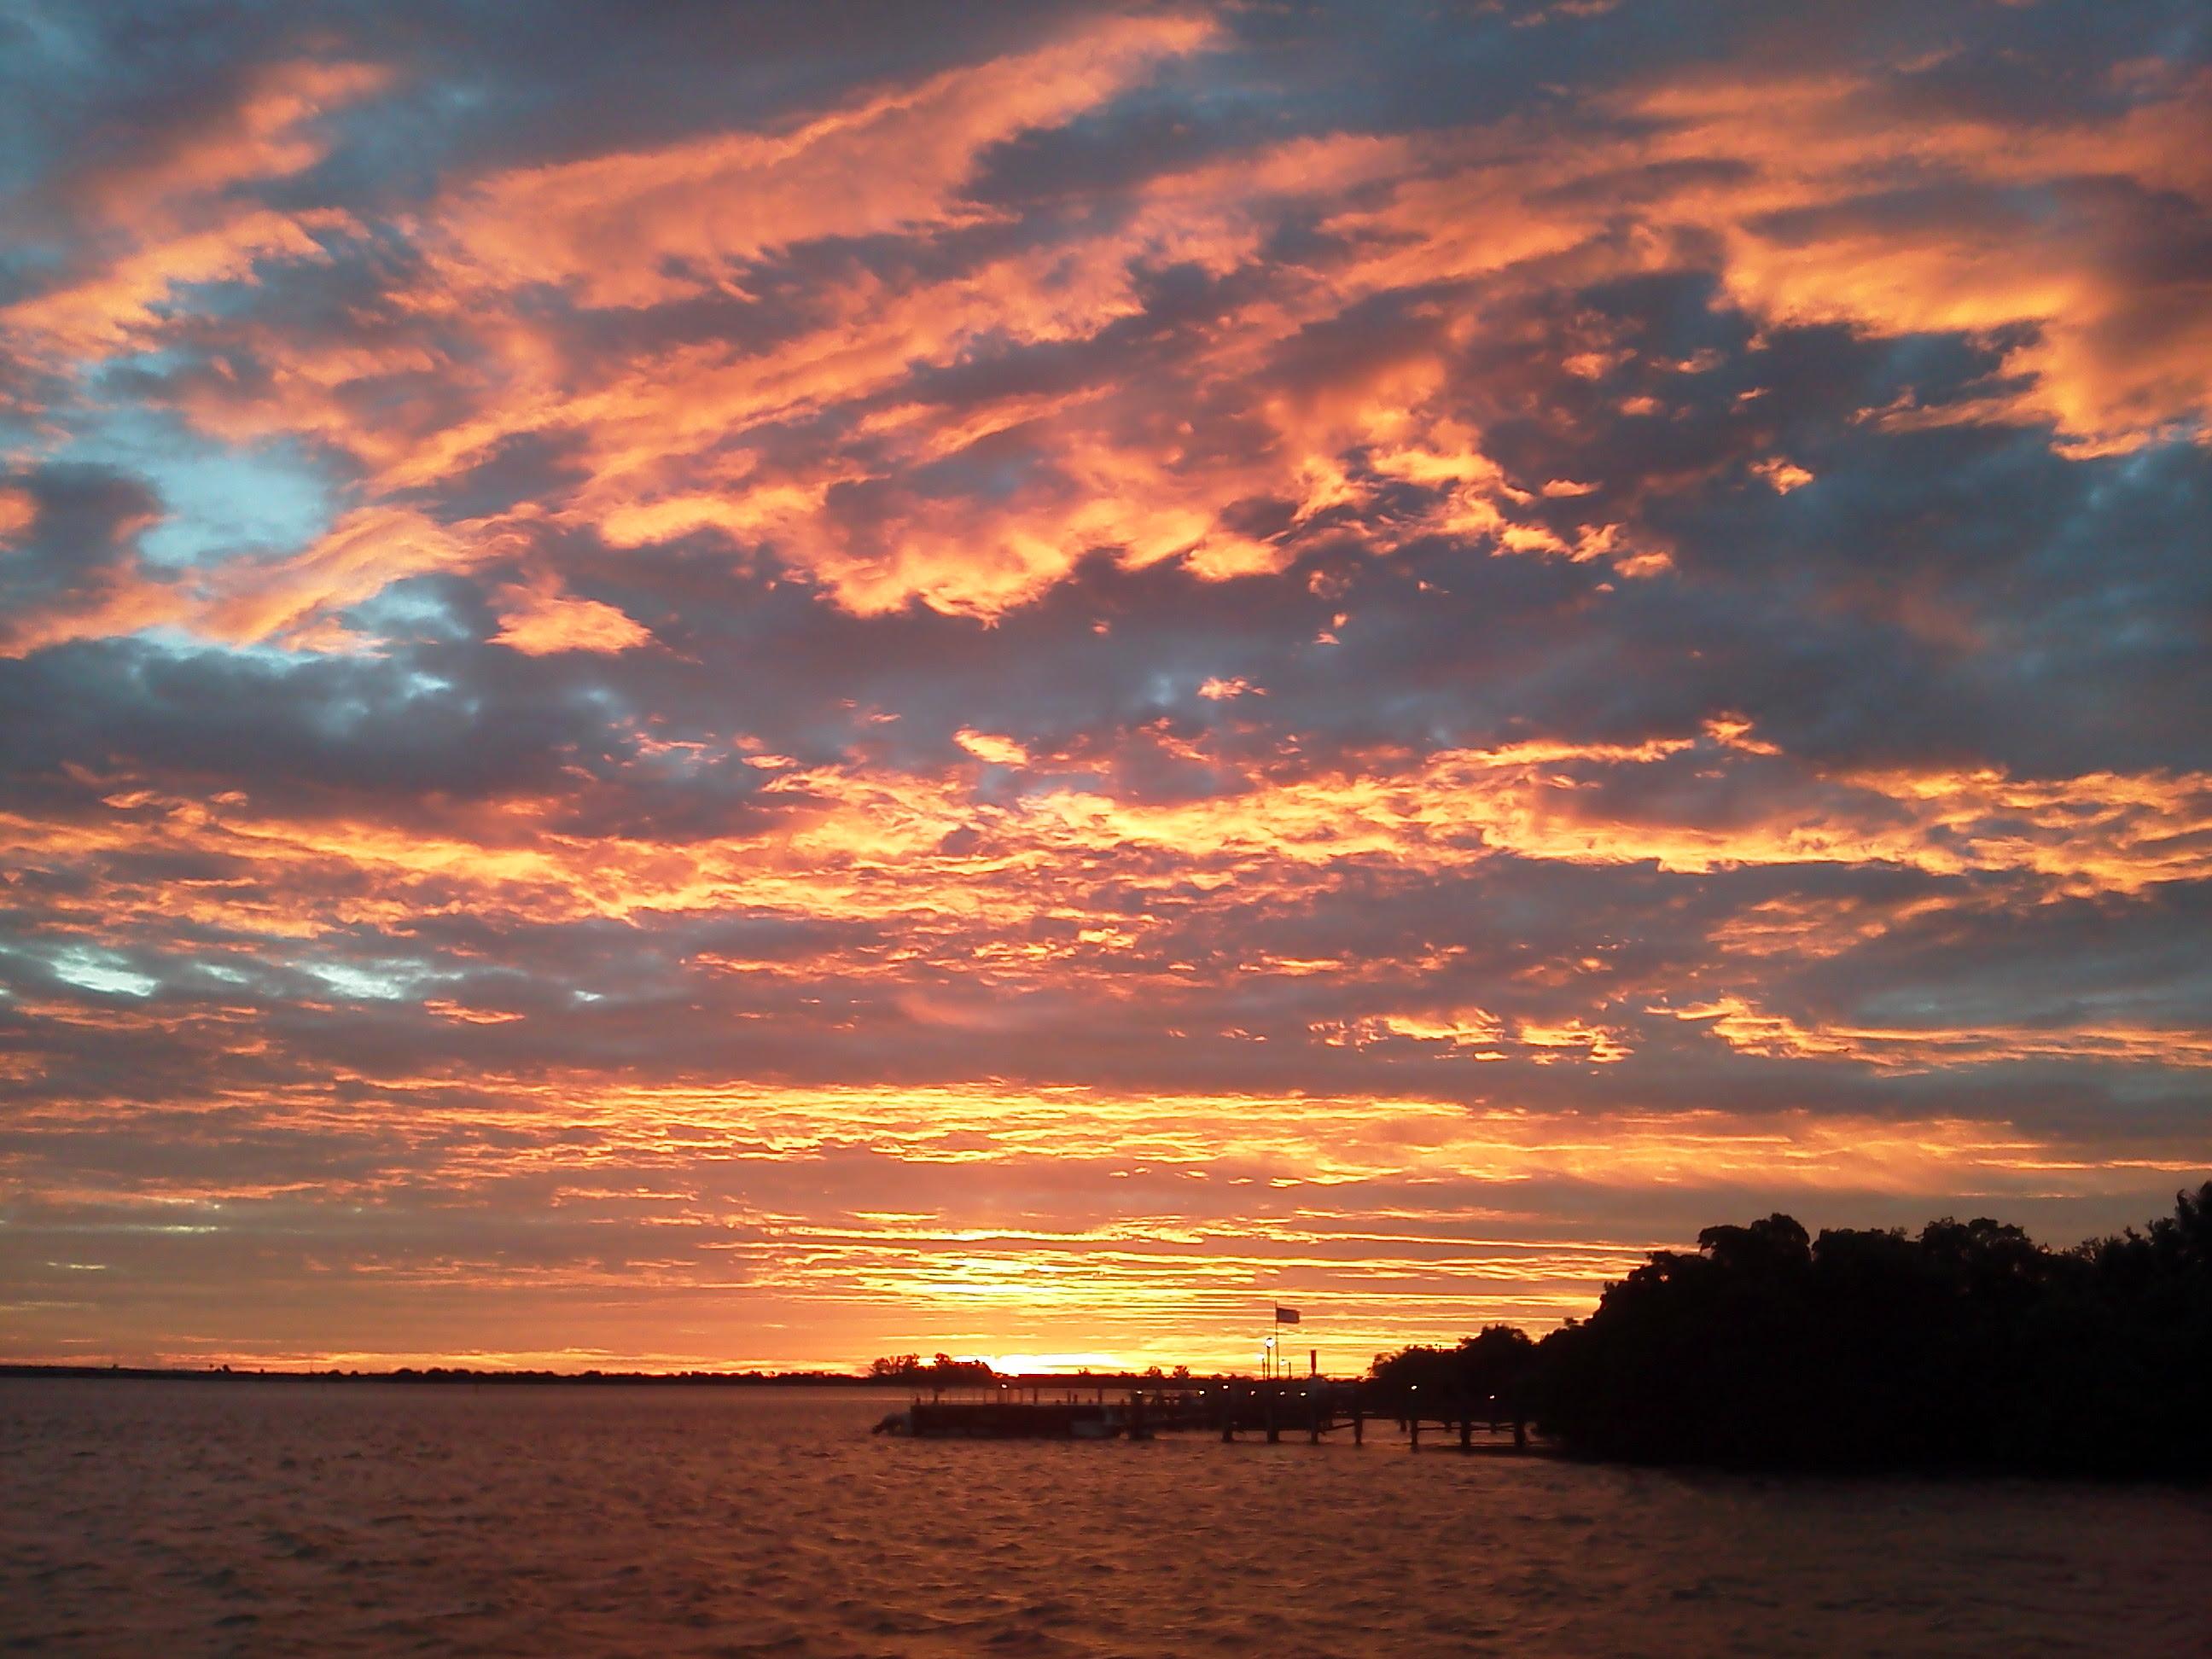 http://upload.wikimedia.org/wikipedia/commons/3/3d/Little_Gasparilla_sunrise.jpg